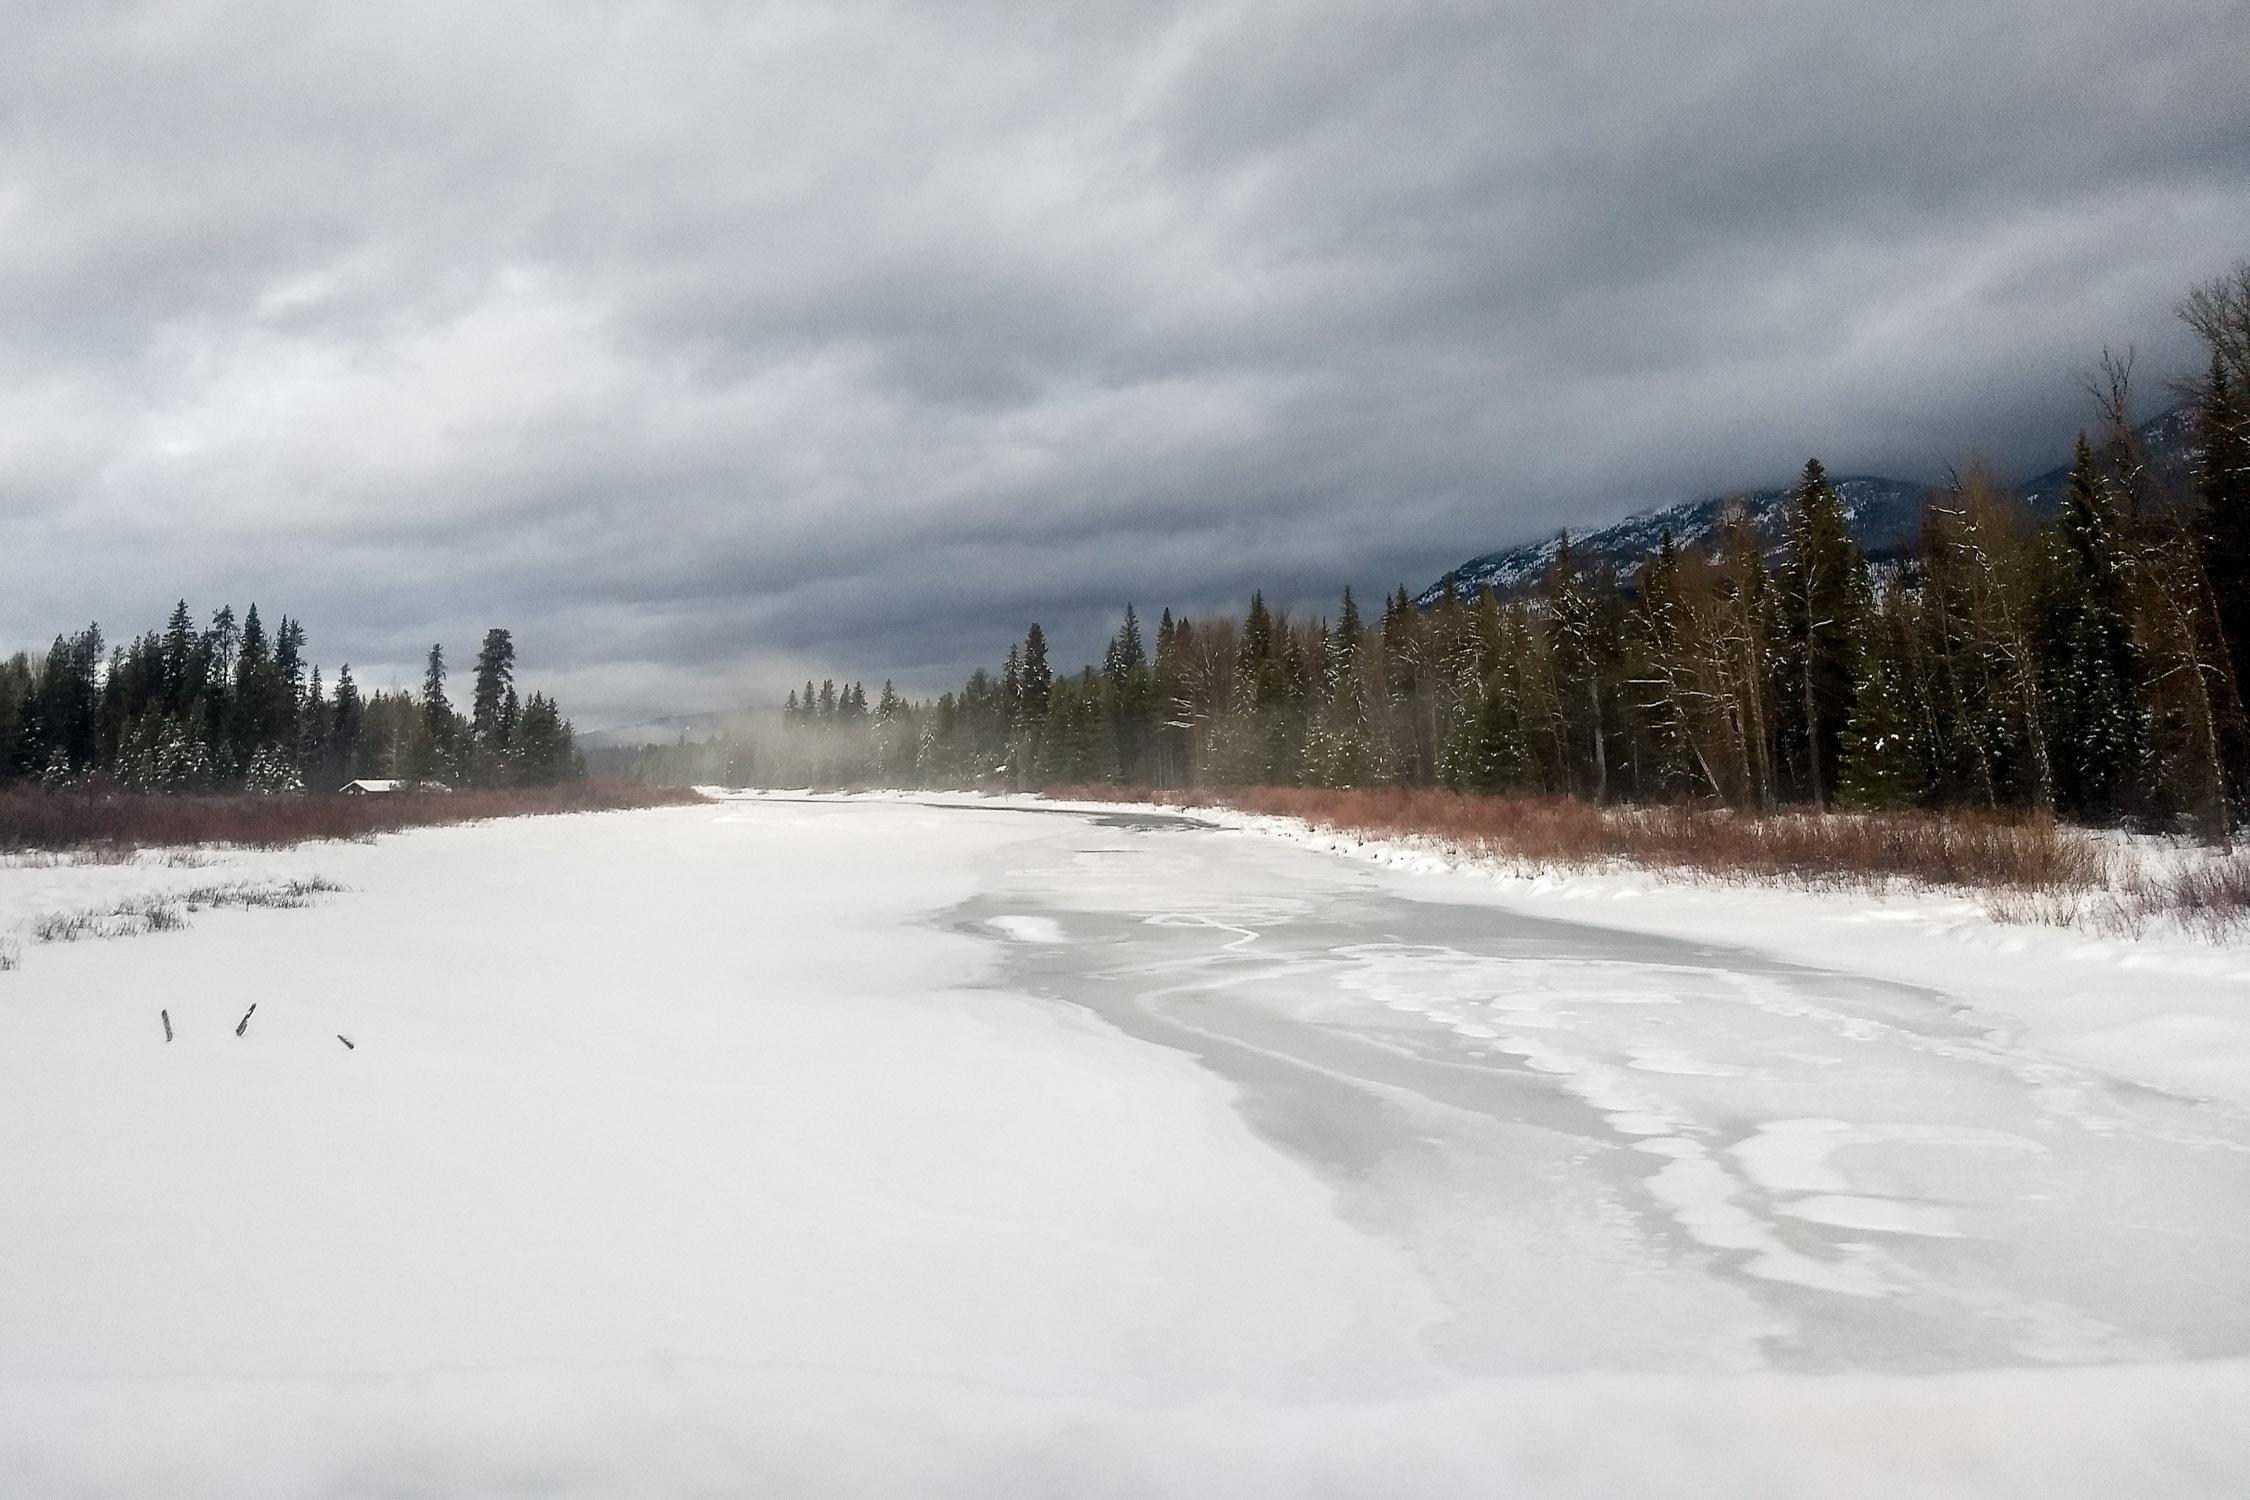 Stillwater Creek frozen over. Photo by Bethany Denton.